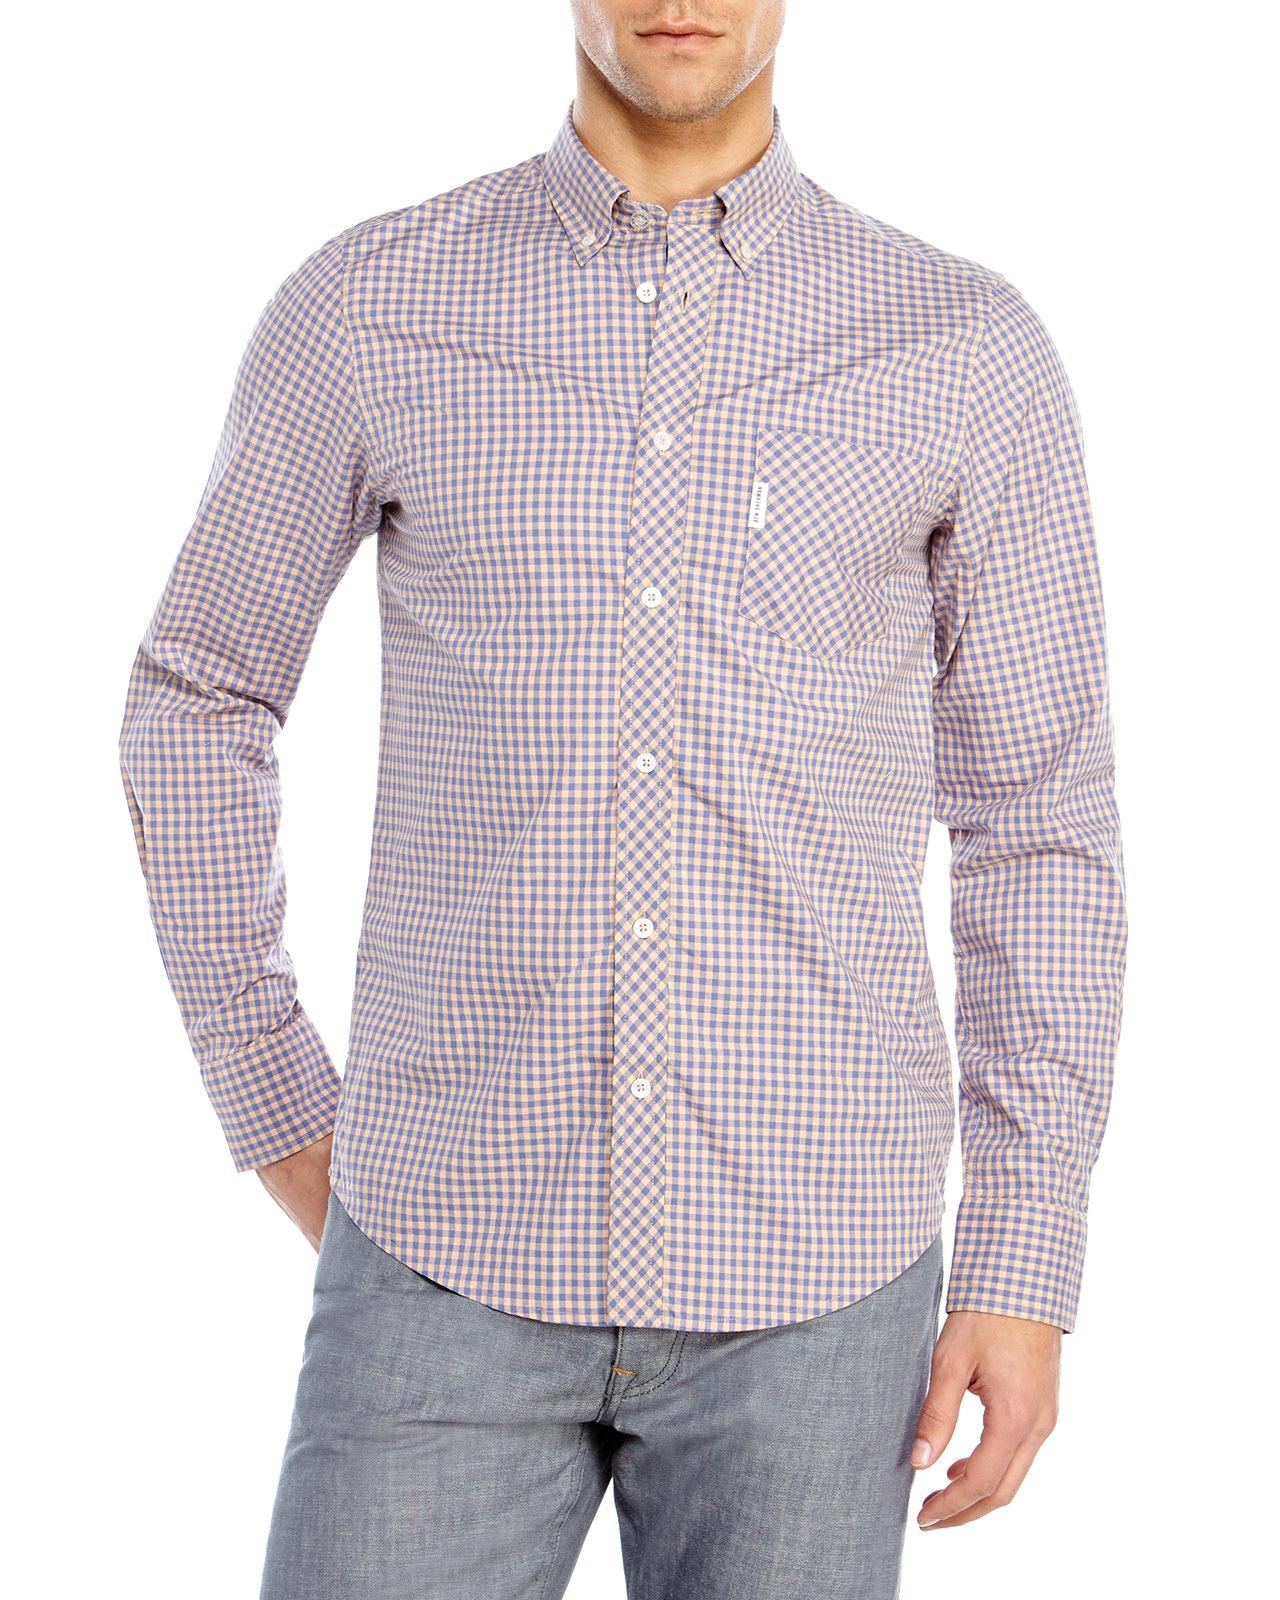 Lyst ben sherman gingham button down shirt in blue for men for Blue gingham button down shirt